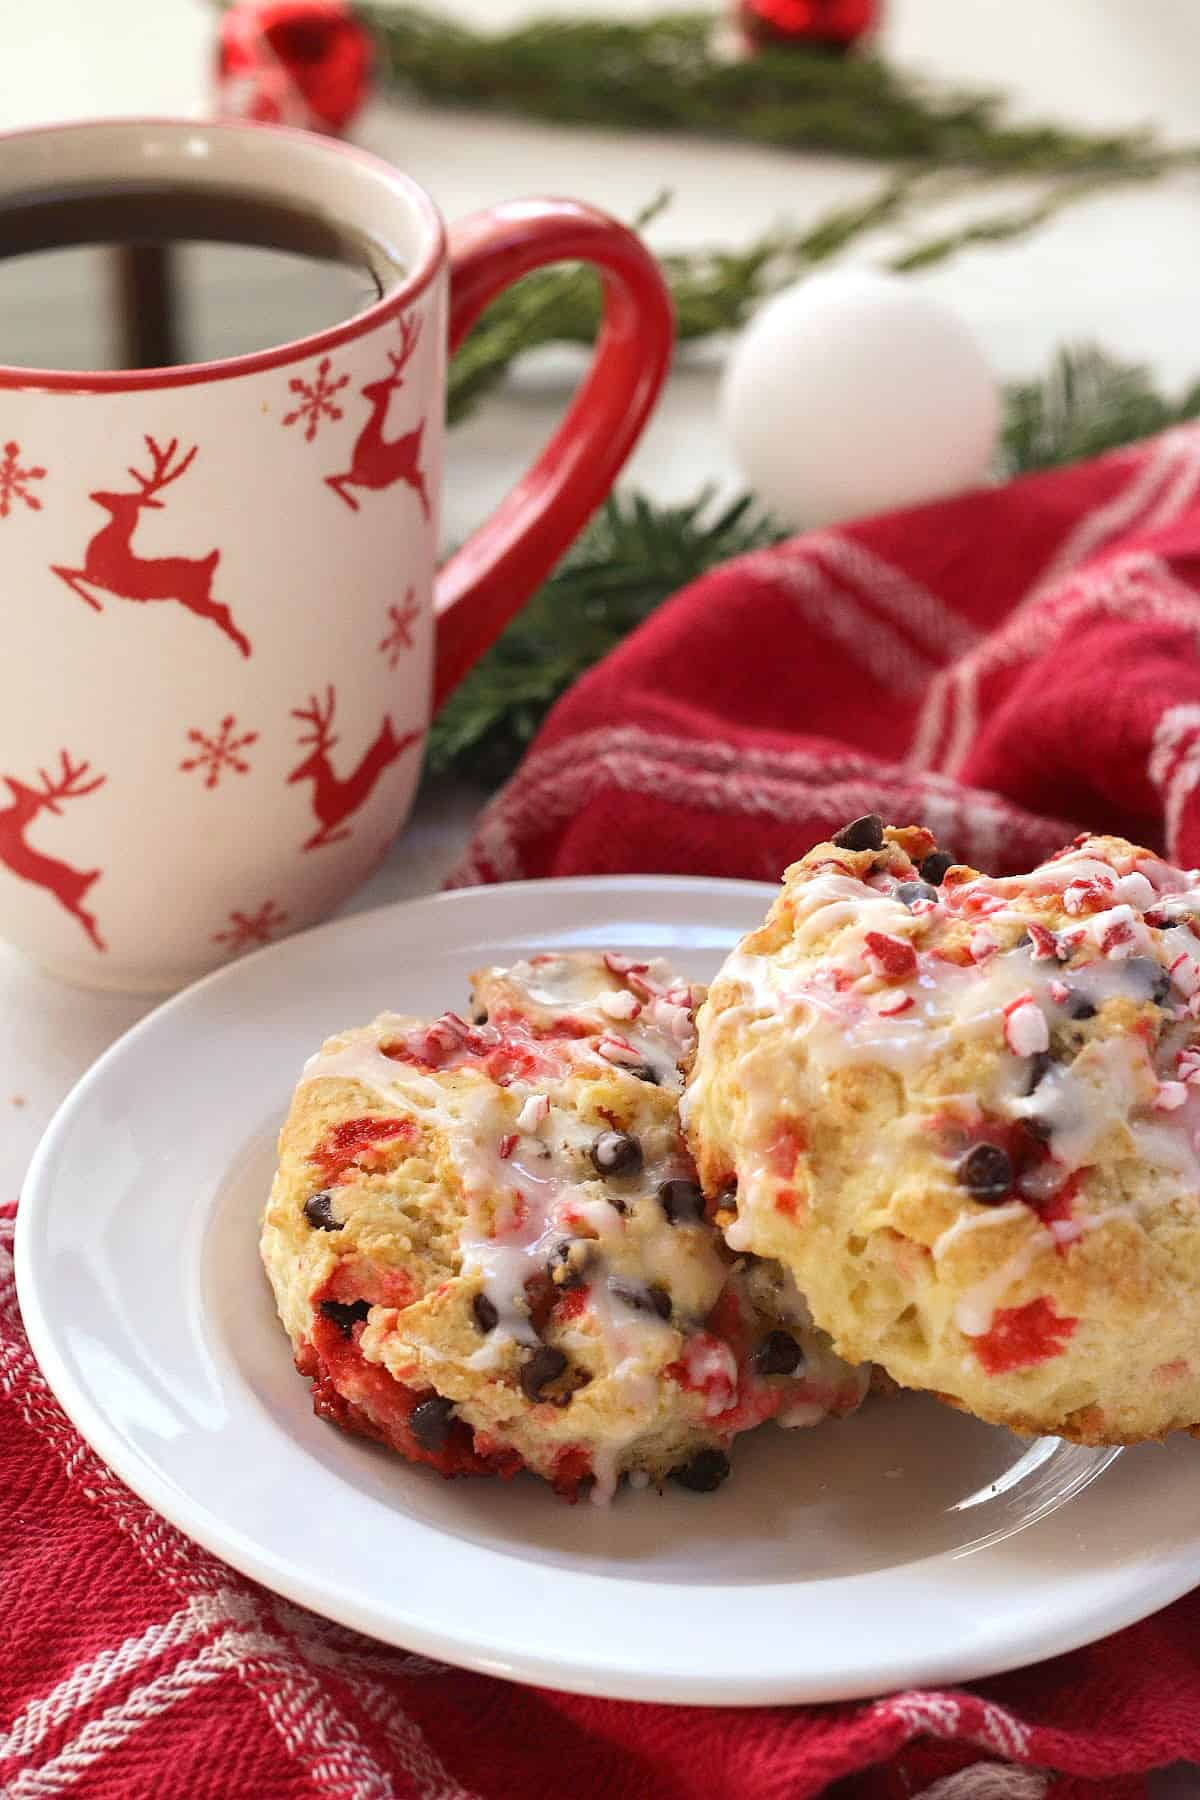 chocolate chip peppermint scones & tea